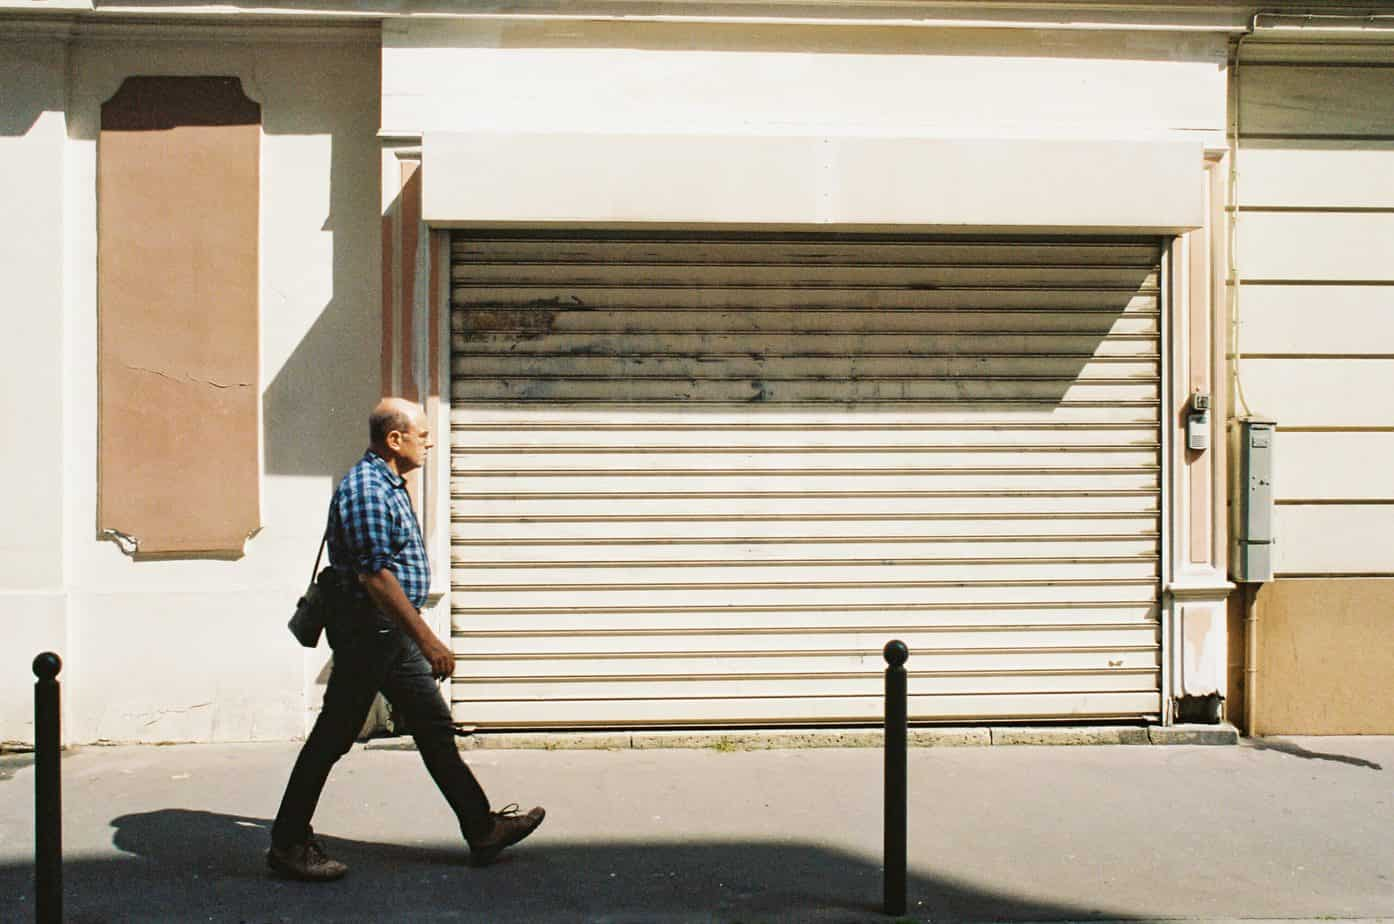 Stationärer Handel und der E-Commerce – 5 Gründe warum der stationäre Handel E-Commerce scheut.